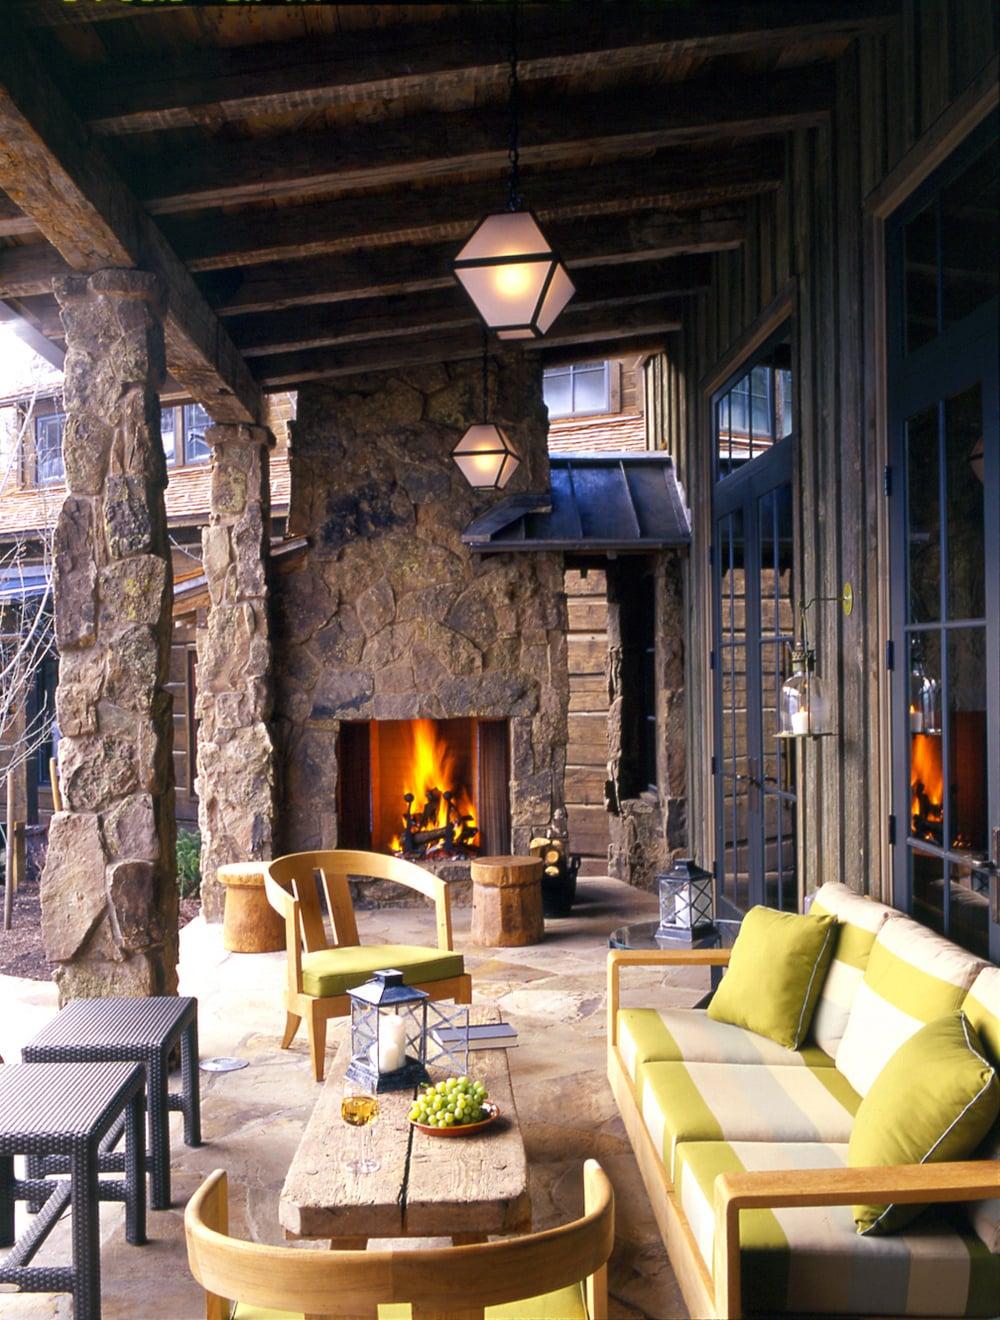 Snowmass_Village.Slope_Side_Lane.Ski_House.Robert_Orr_&_Associates.Architecture.Landscape_Architecture.New_Urbanism.Lebovitz_House.Porch.jpg